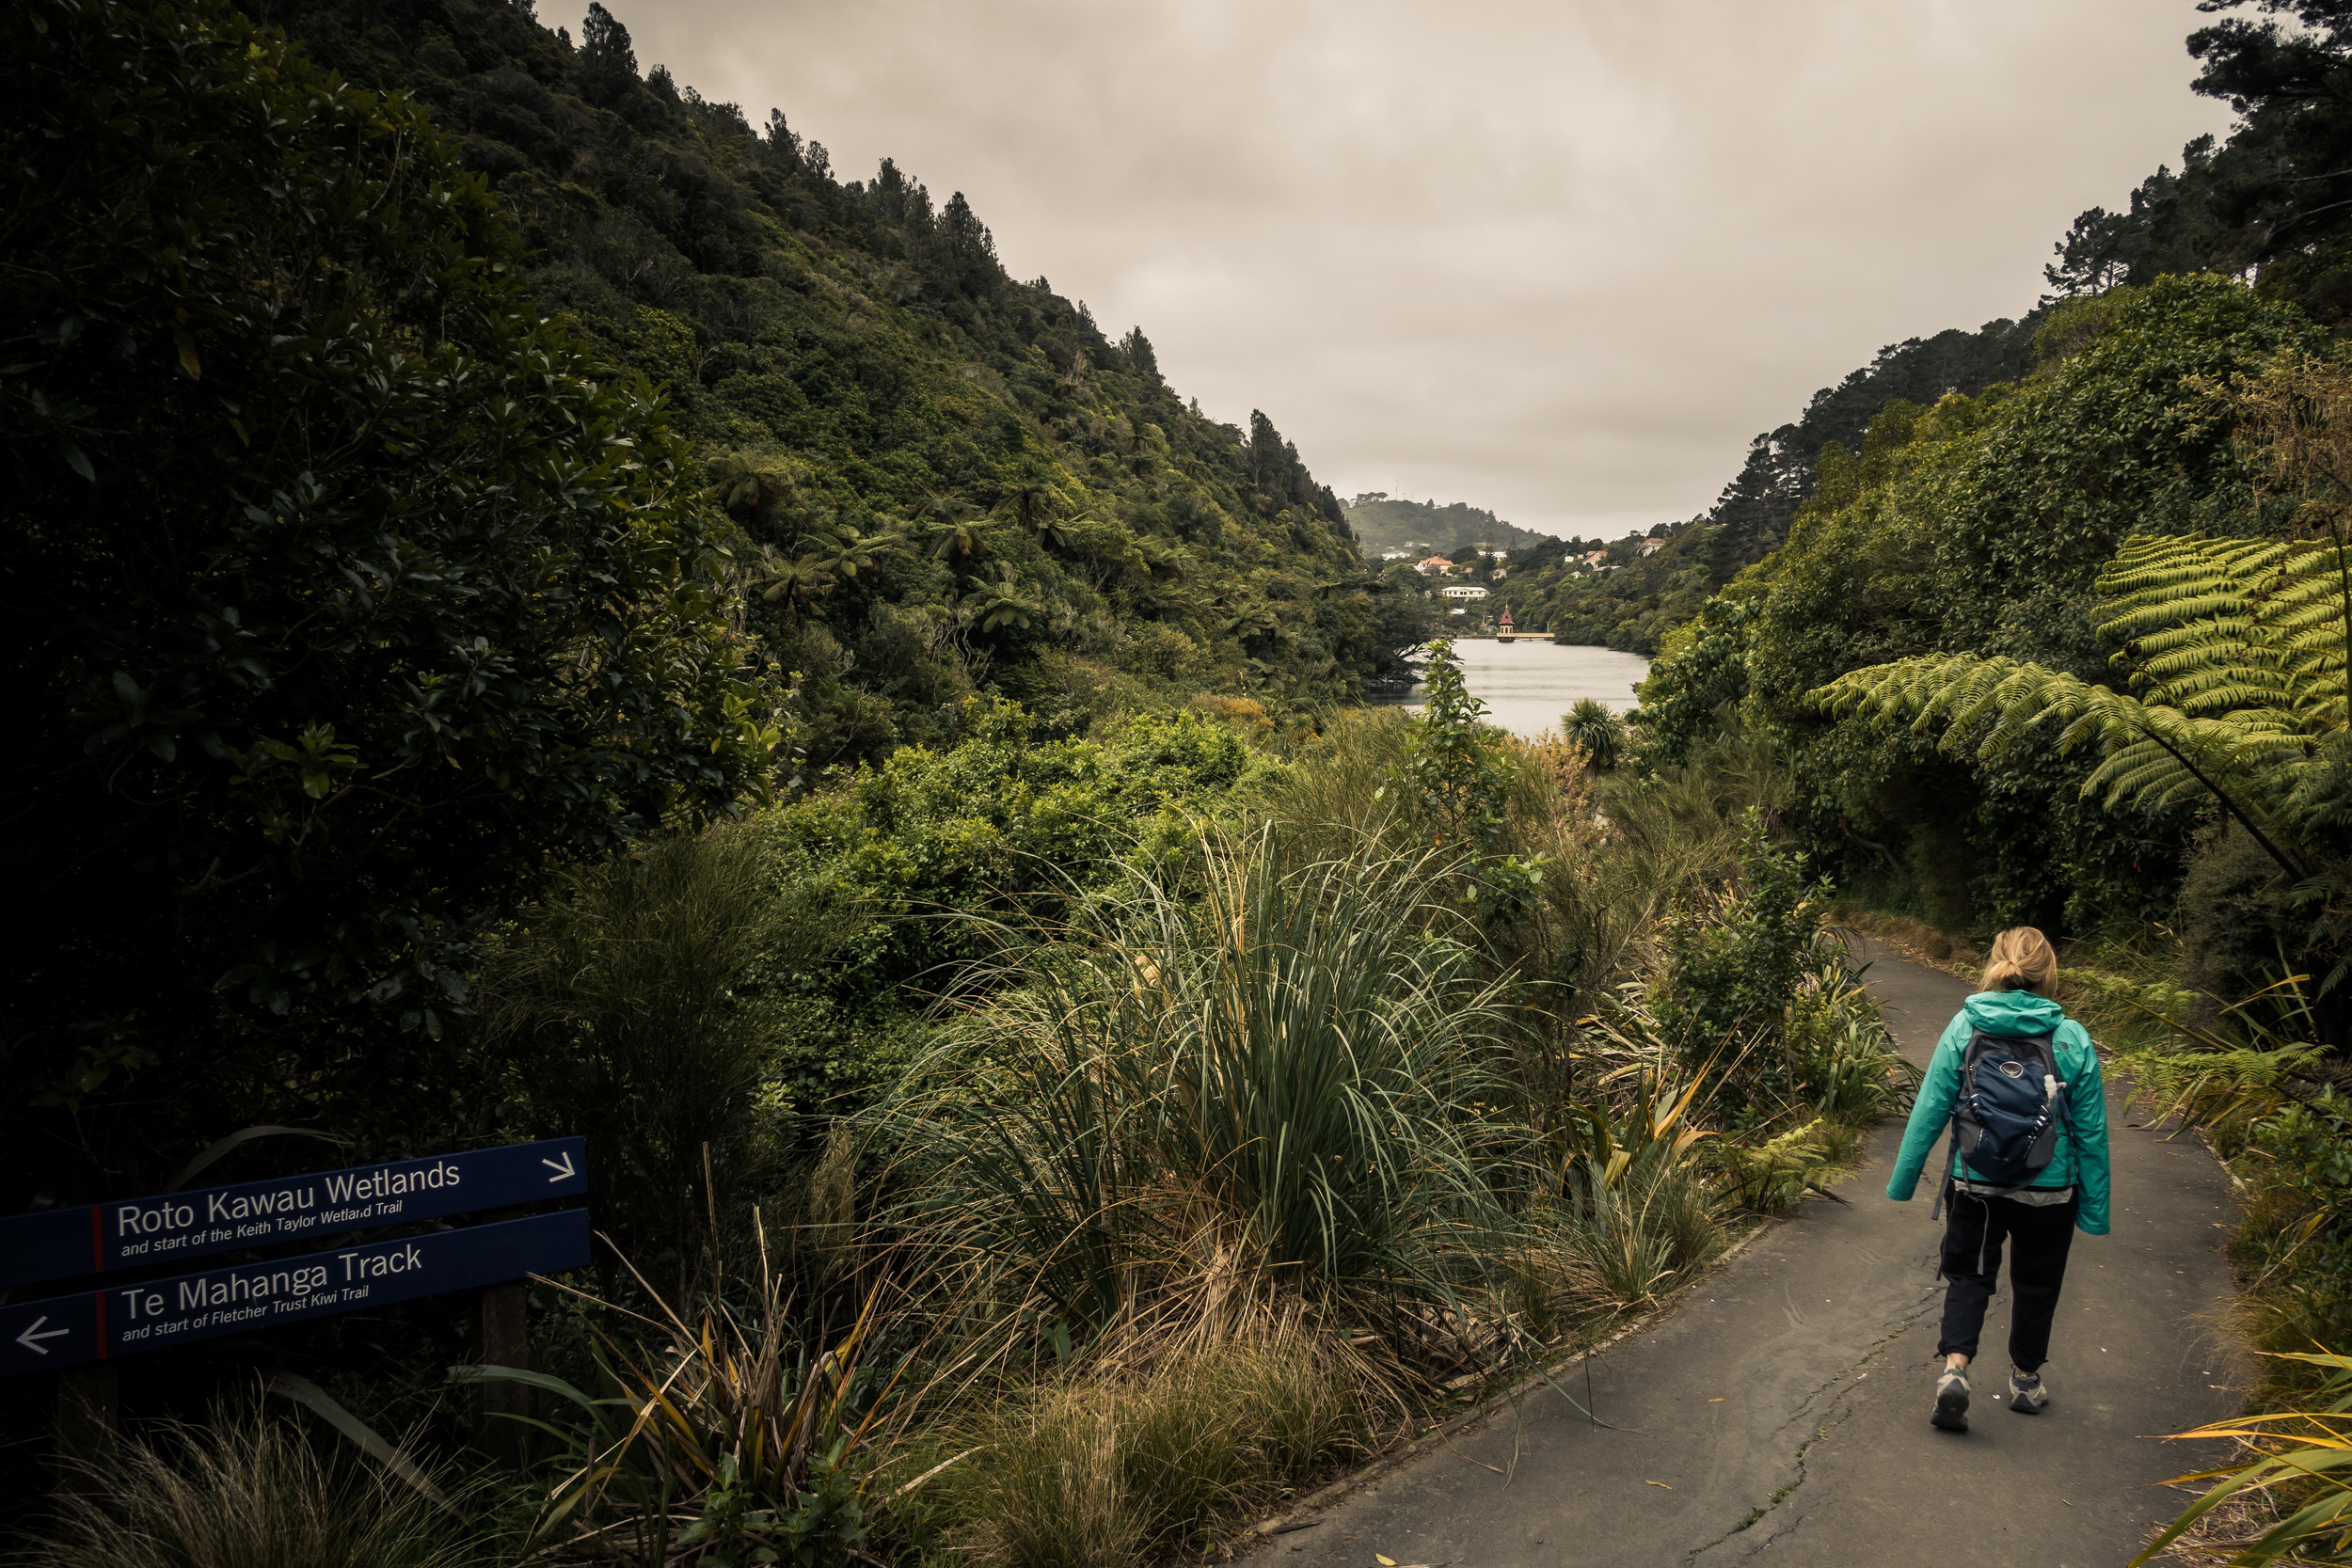 NEW ZEALAND - ZEALANDIA WILDLIFE SANCTUARY